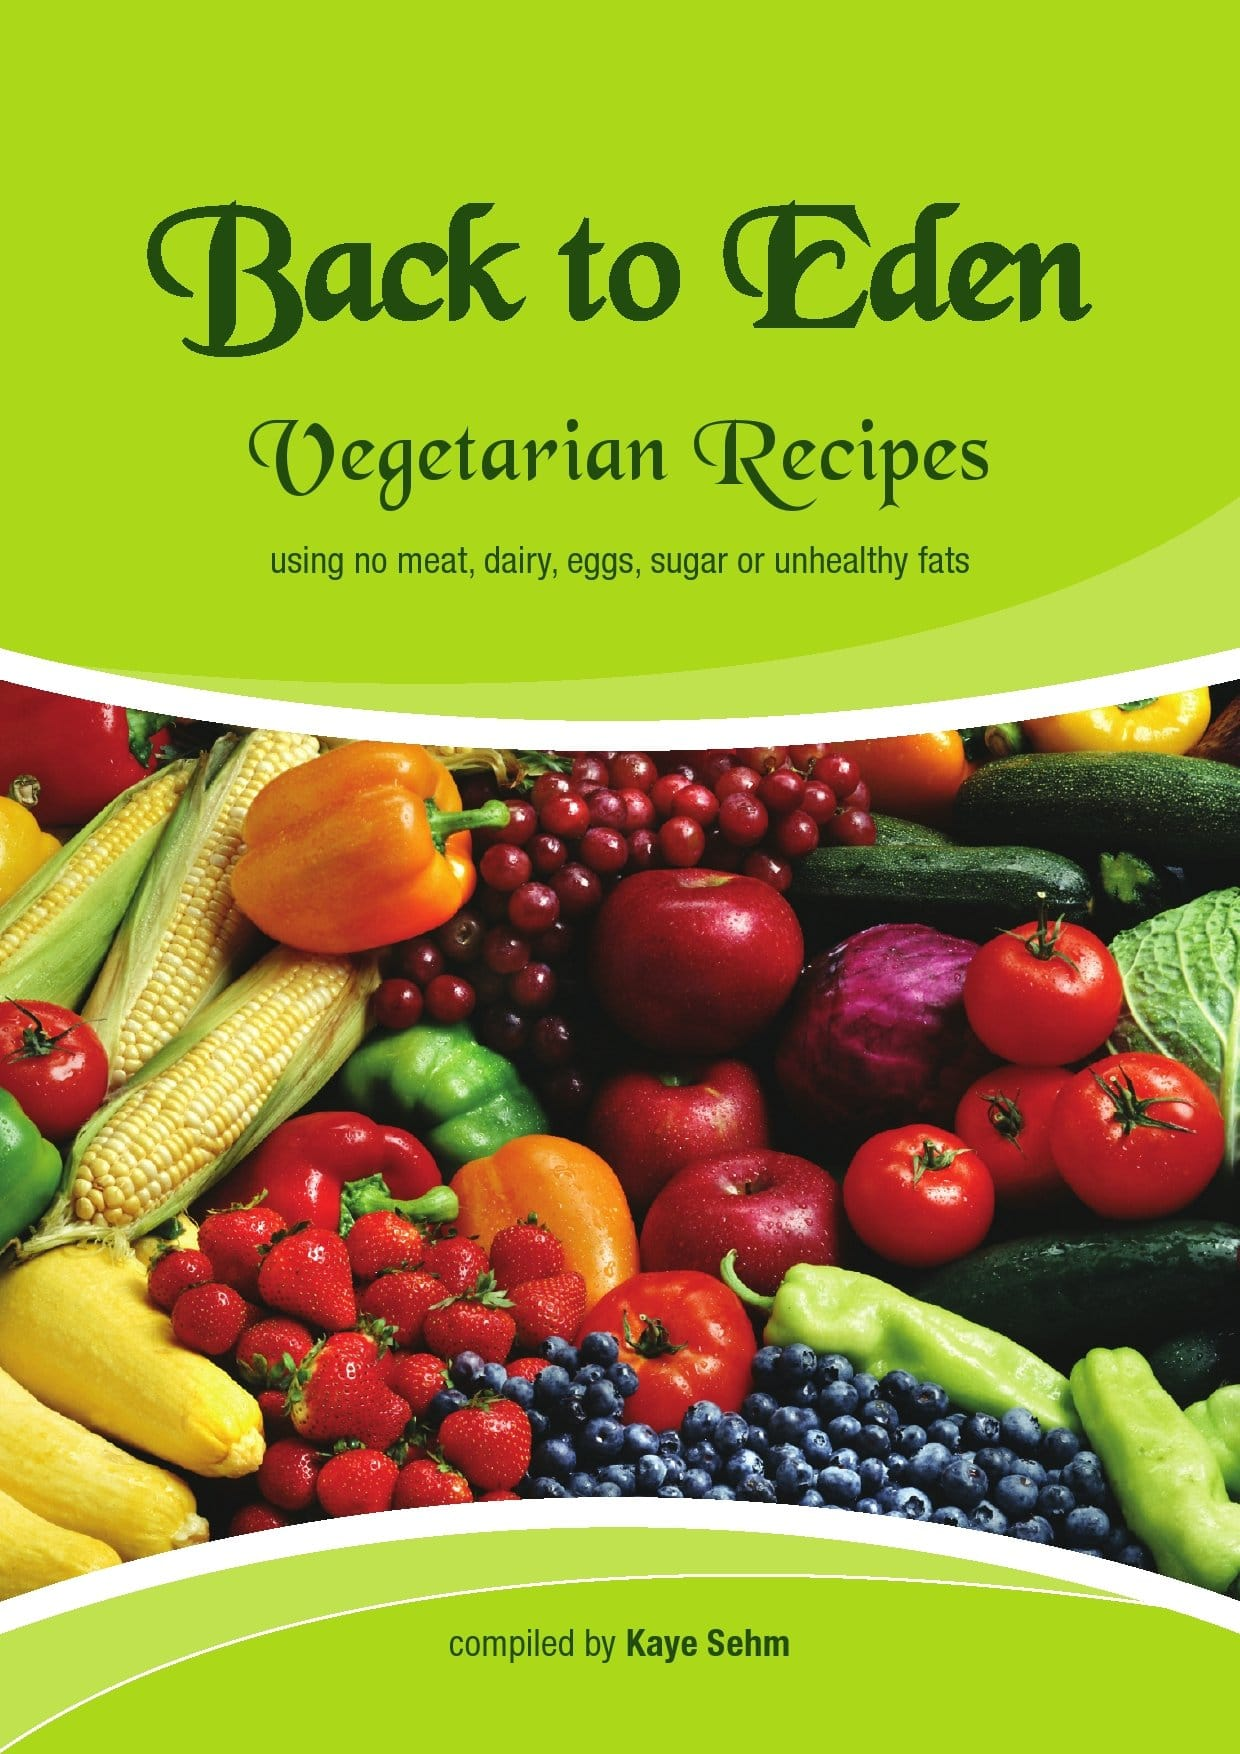 Vegan vegetarian recipe book kayes recipes and remedies vegan vegetarian recipe book forumfinder Choice Image